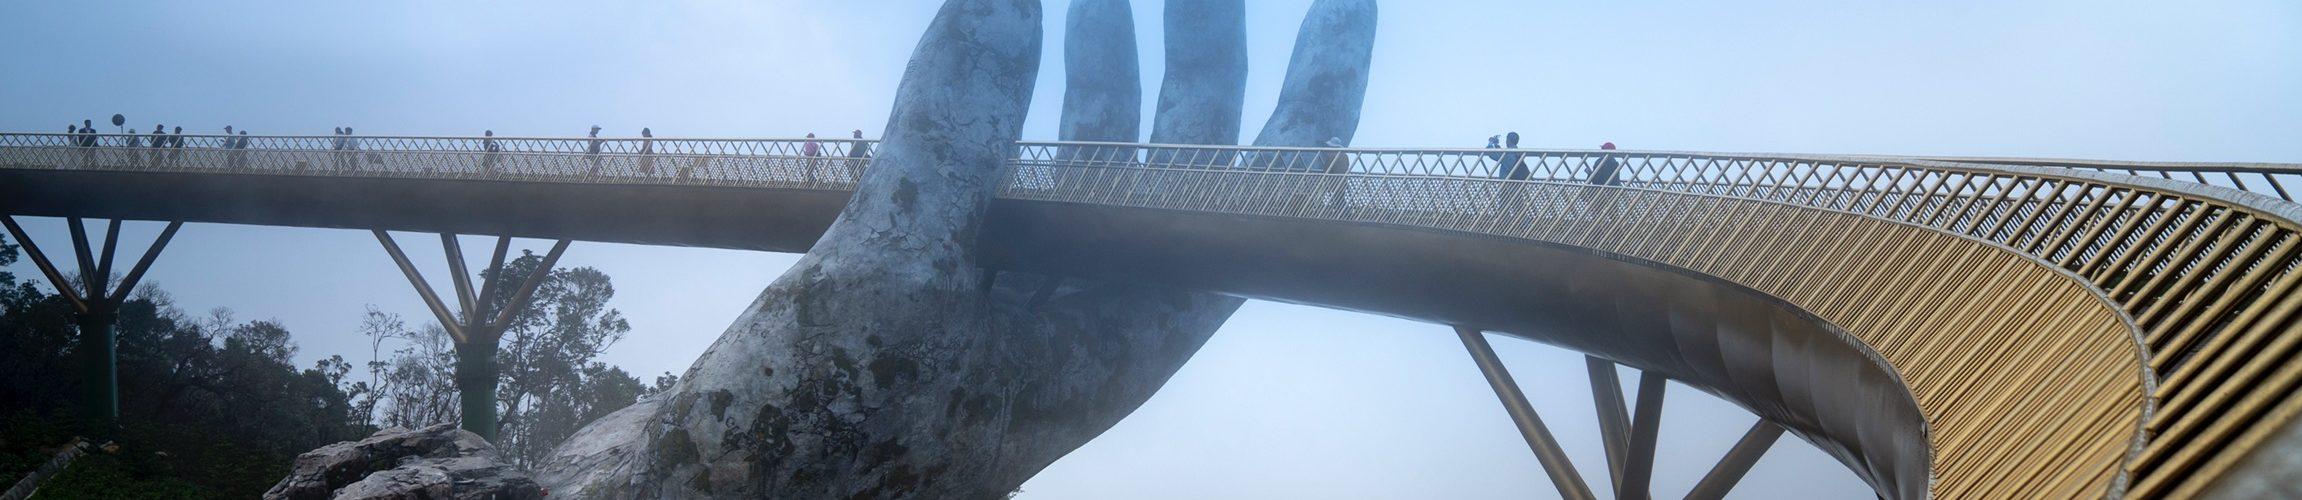 The golden bridge in Bana hill Danang - Private Vietnam Tour